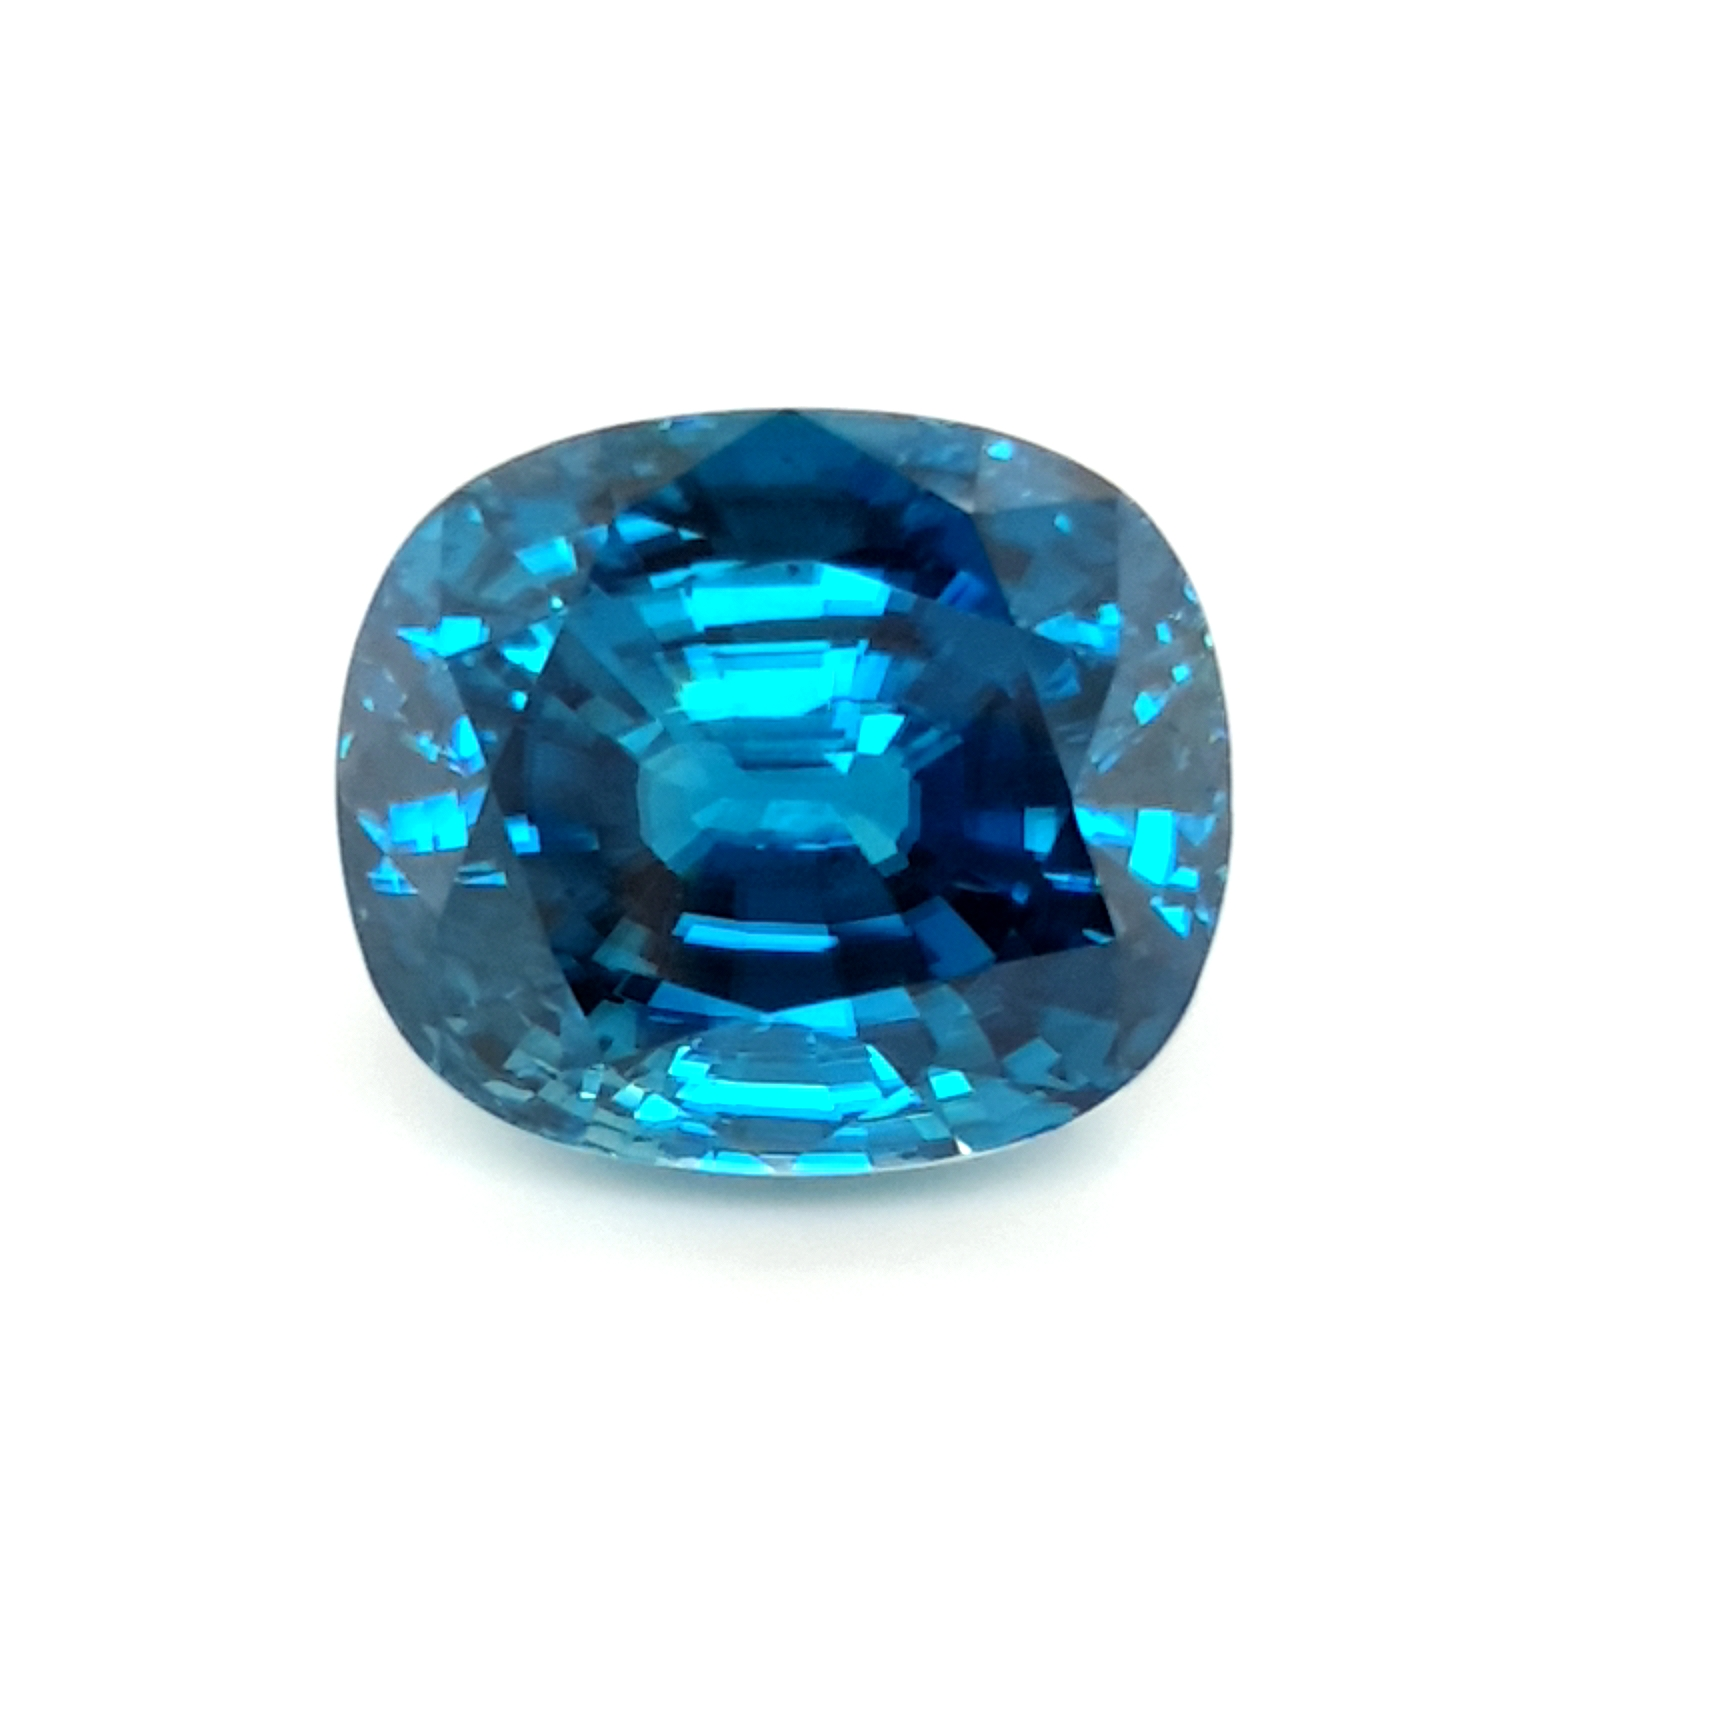 30,31ct. Starlight Blue Zircon ZCK18D2 ClaudiaHamann__2021-04-15-21-41-37